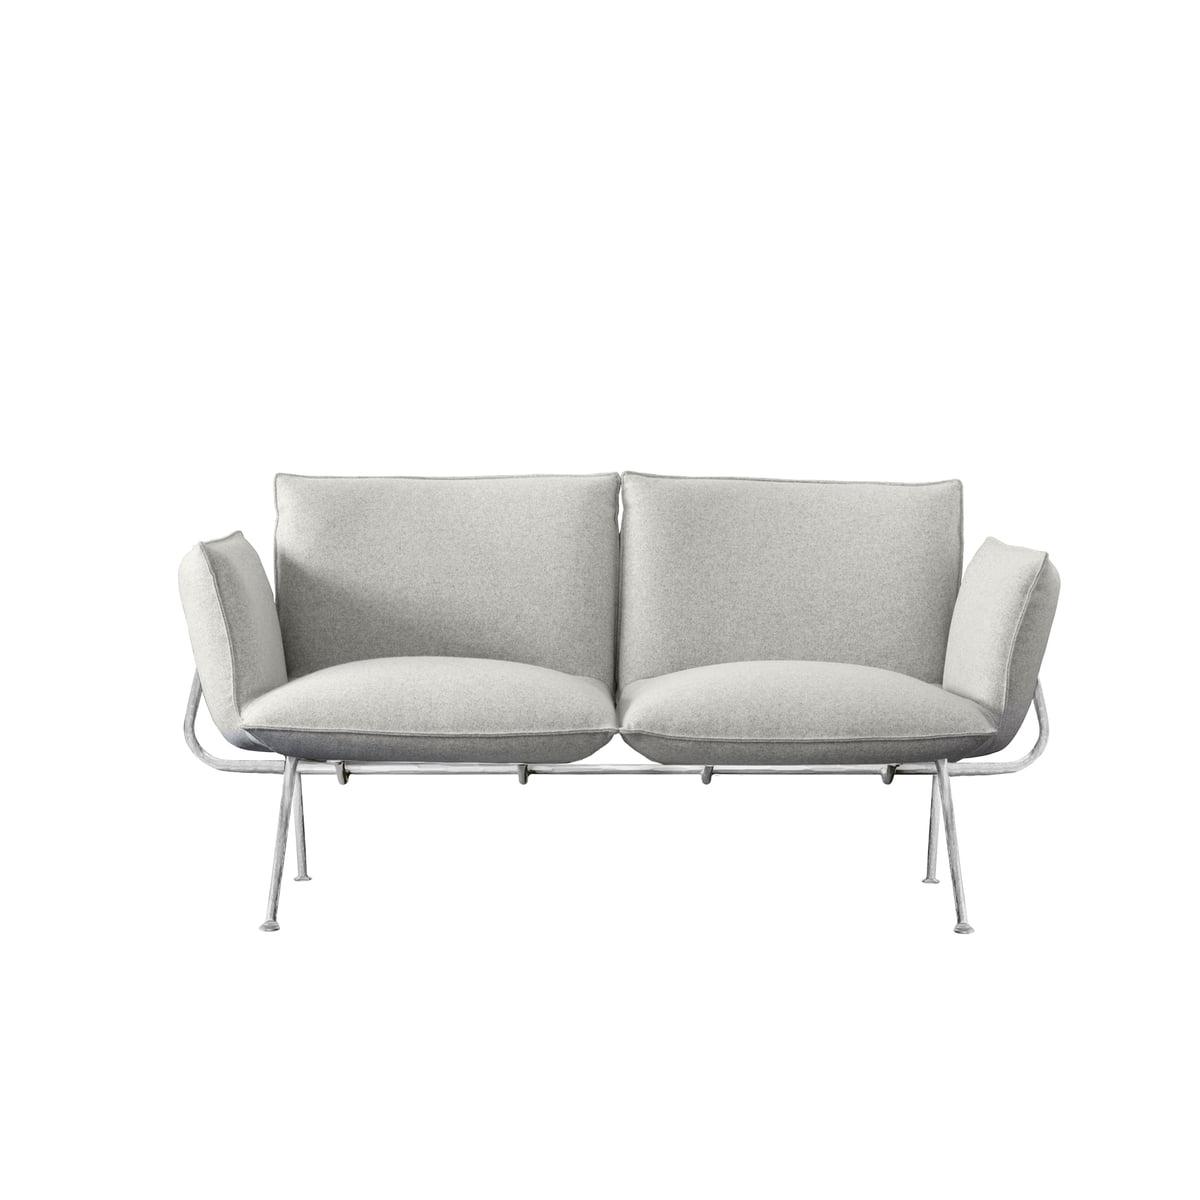 Remarkable Magis Officina 2 Seater Sofa Galvanised Frame Cover Light Grey Divina Melange 120 Inzonedesignstudio Interior Chair Design Inzonedesignstudiocom